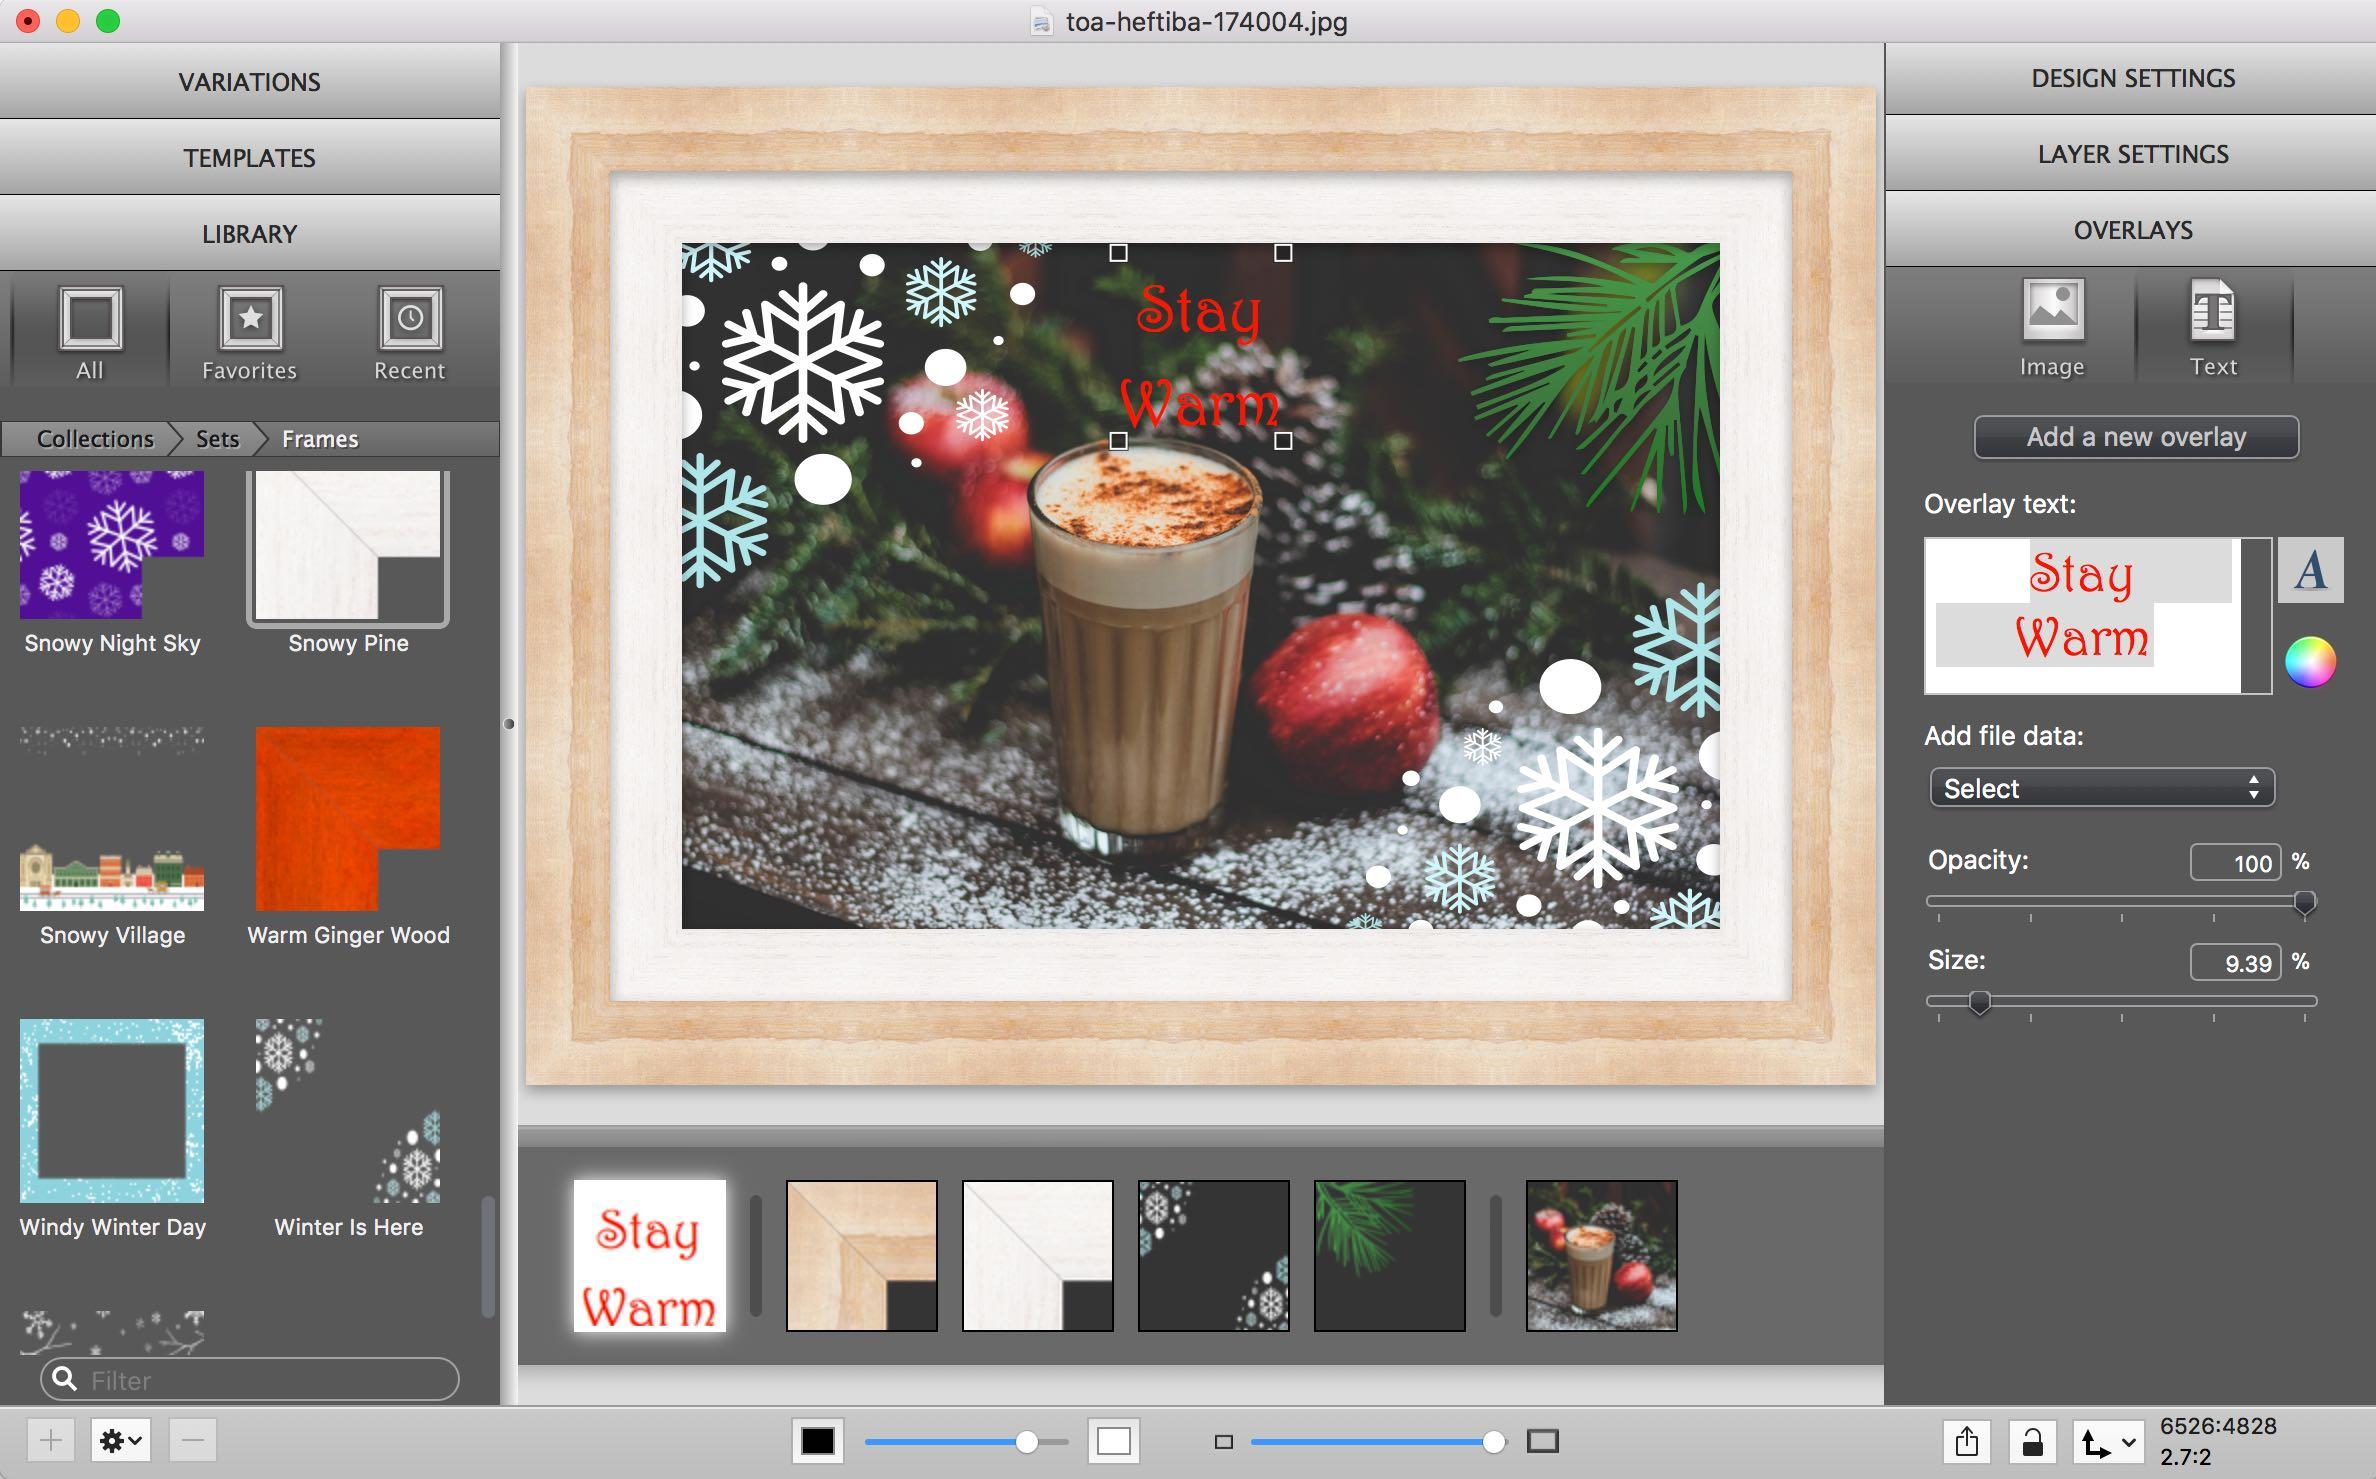 Improved Text Overlays in ImageFramer 4.2